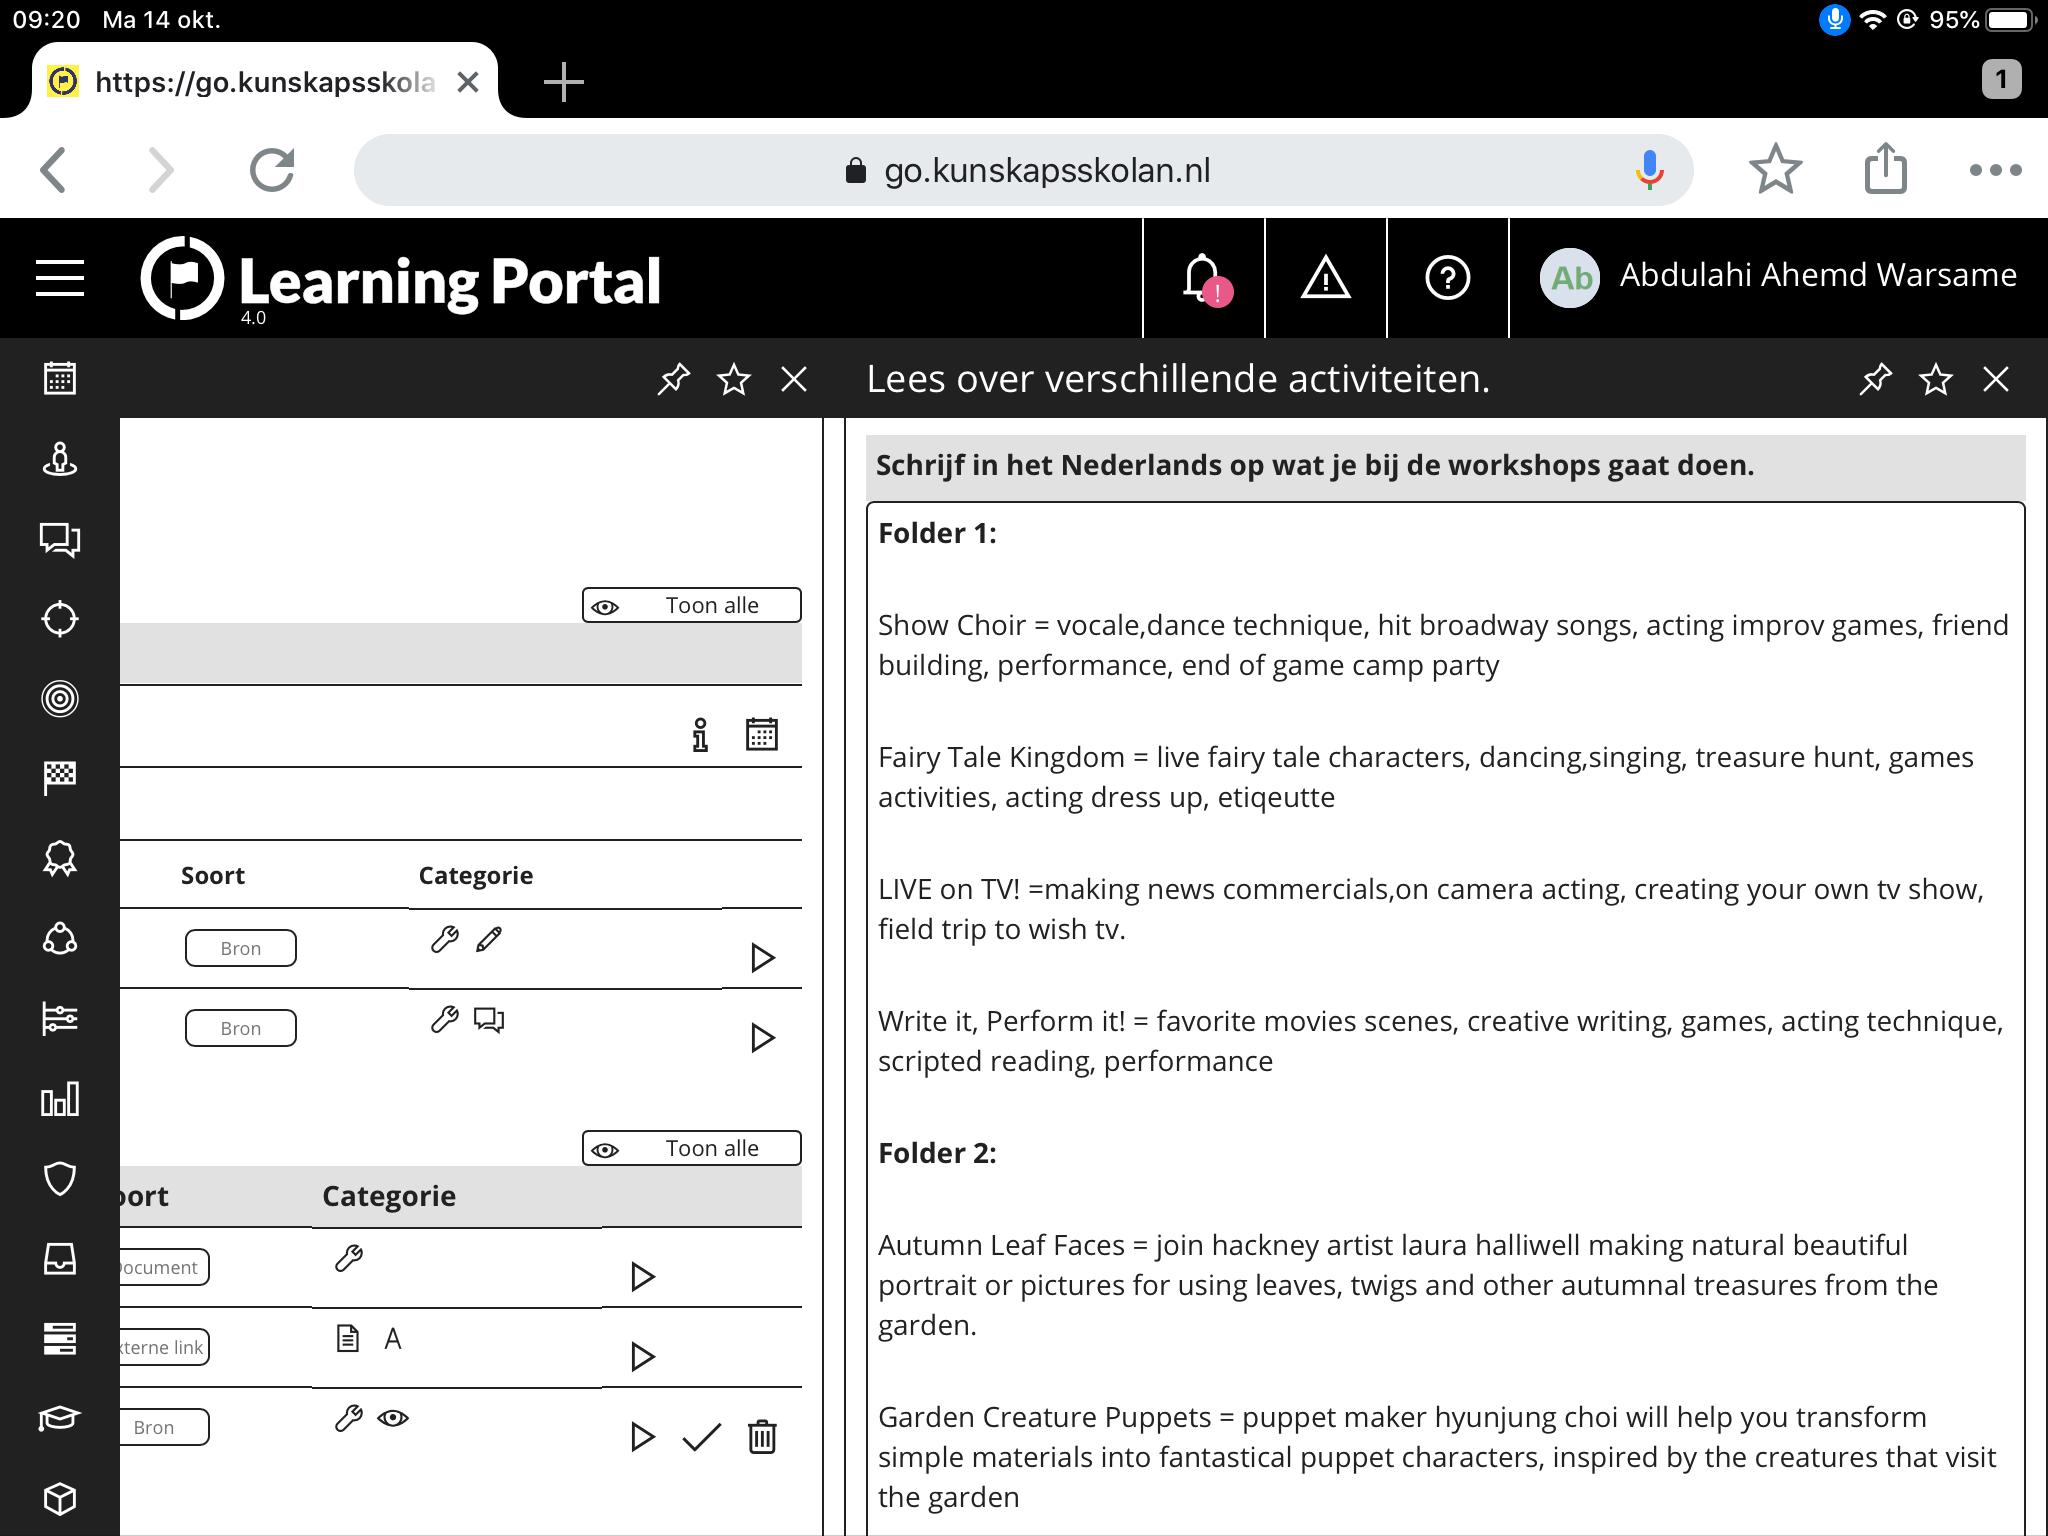 Pin van abdu_😎 op Edje1628 Activiteiten, Folder, Portal